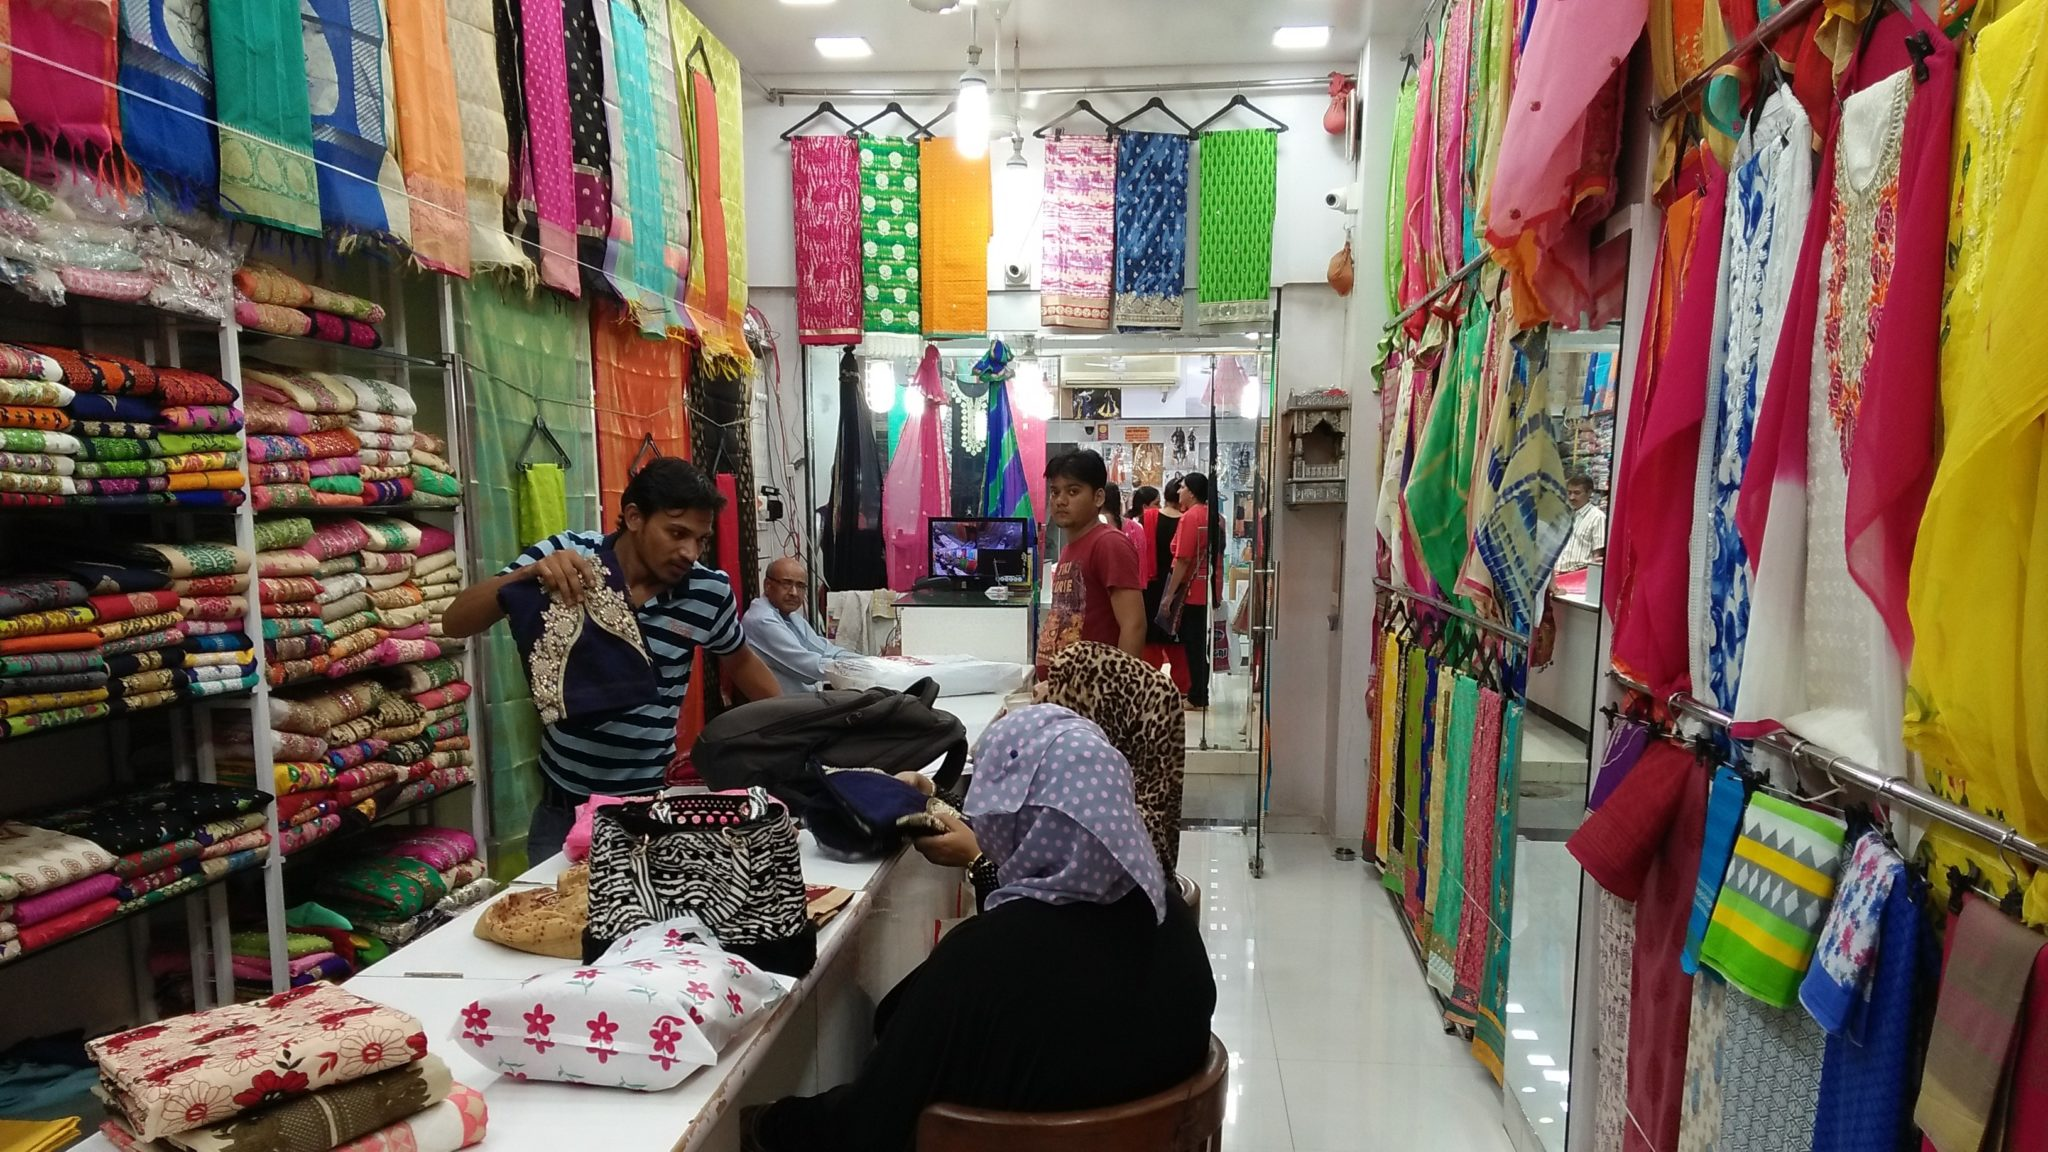 Hindmata Cloth Market Shopping Place in Mumbai